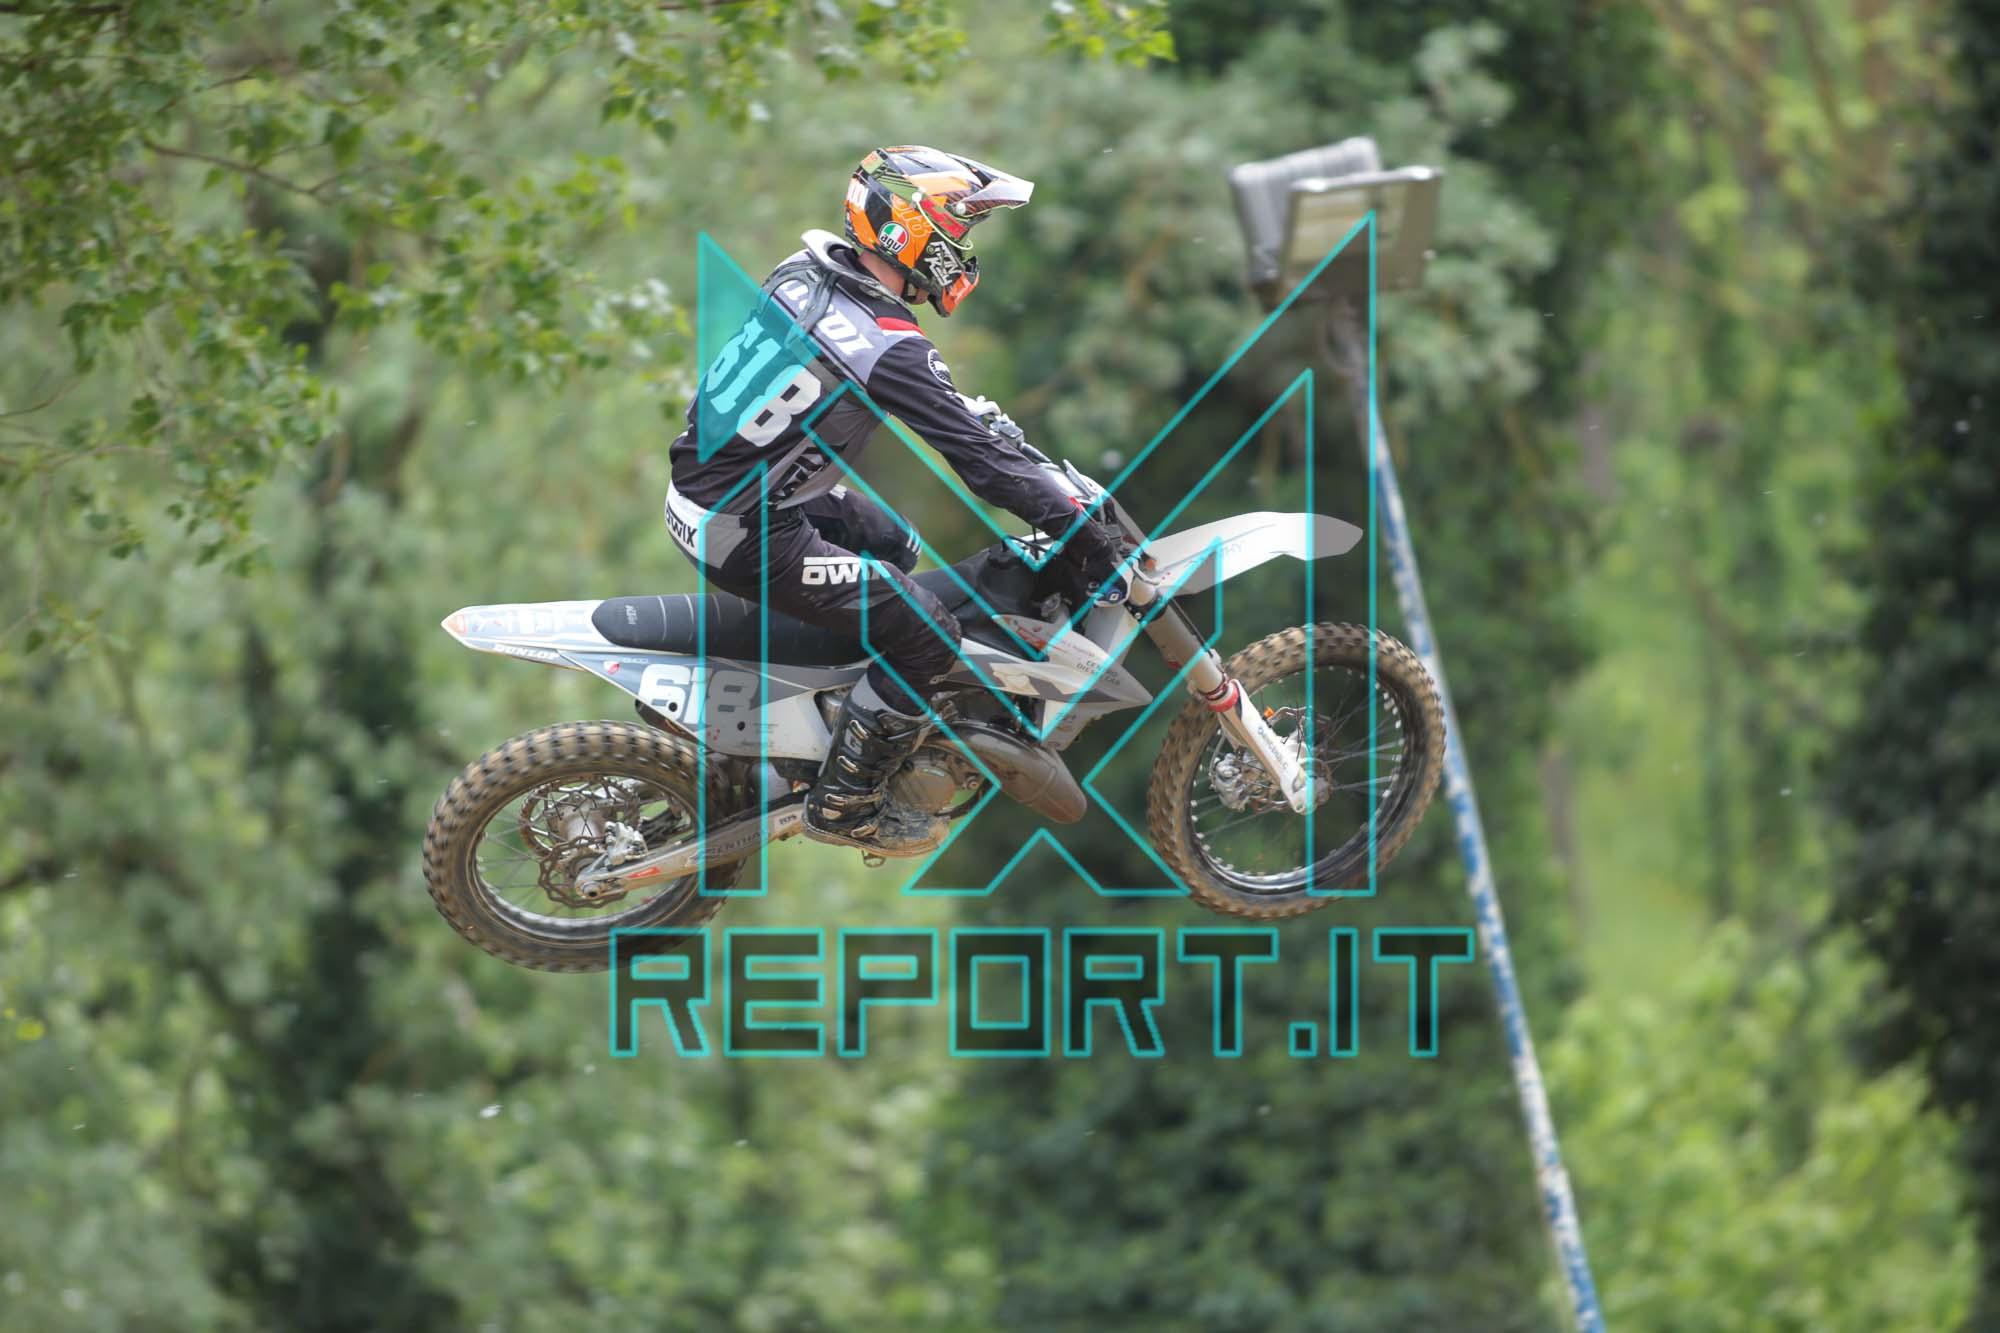 FaenzaFmi-010521-1013